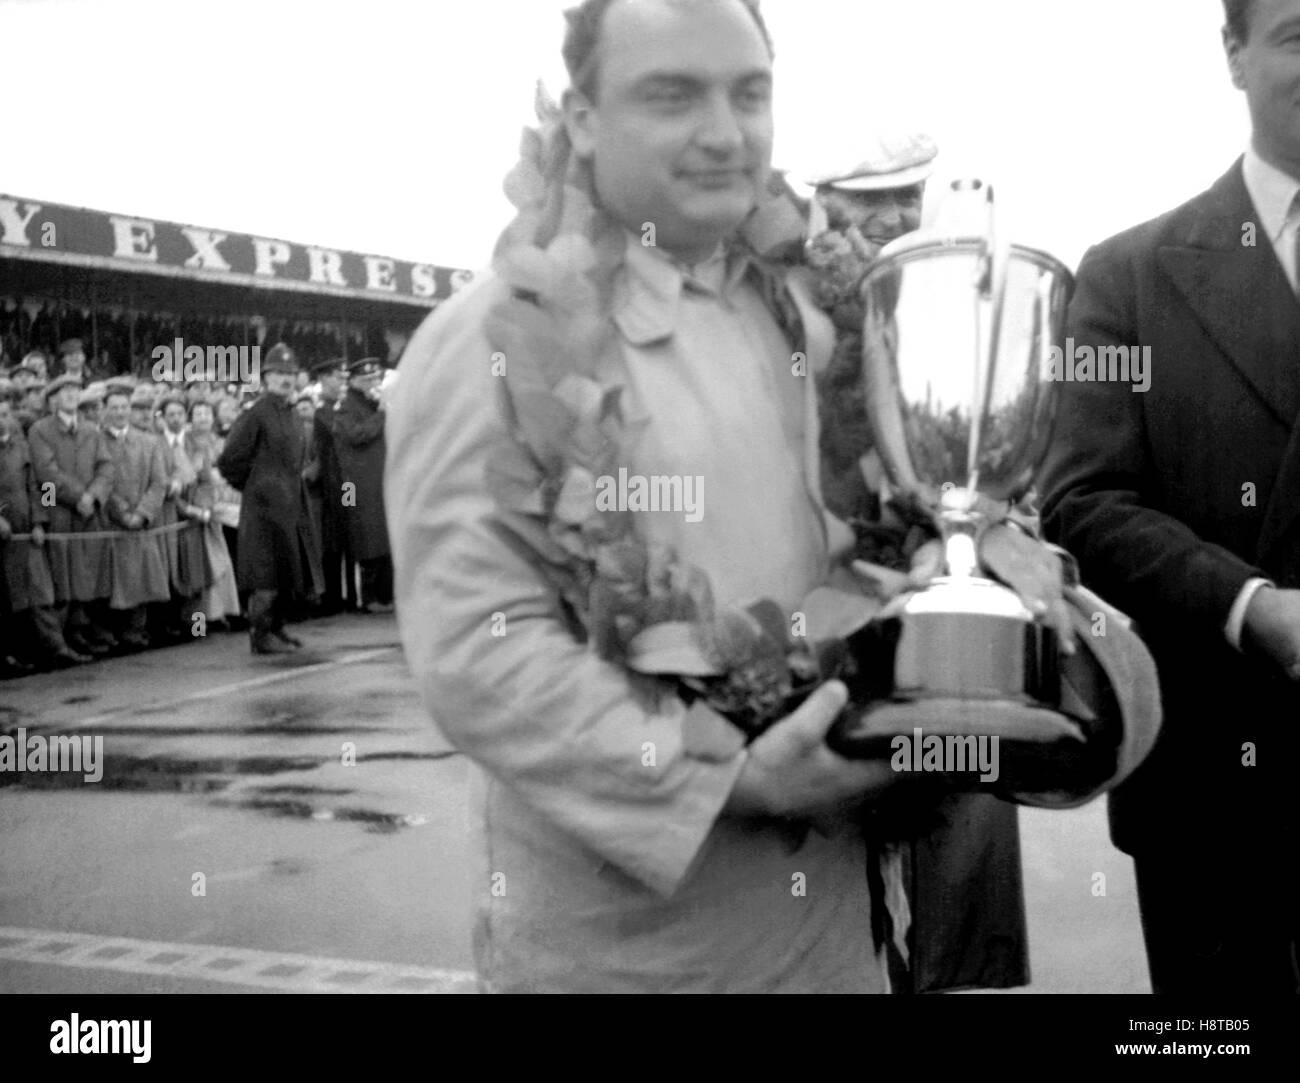 1954 INTERNATIONAL TROPHY GONZALEZ TROPHY - Stock Image